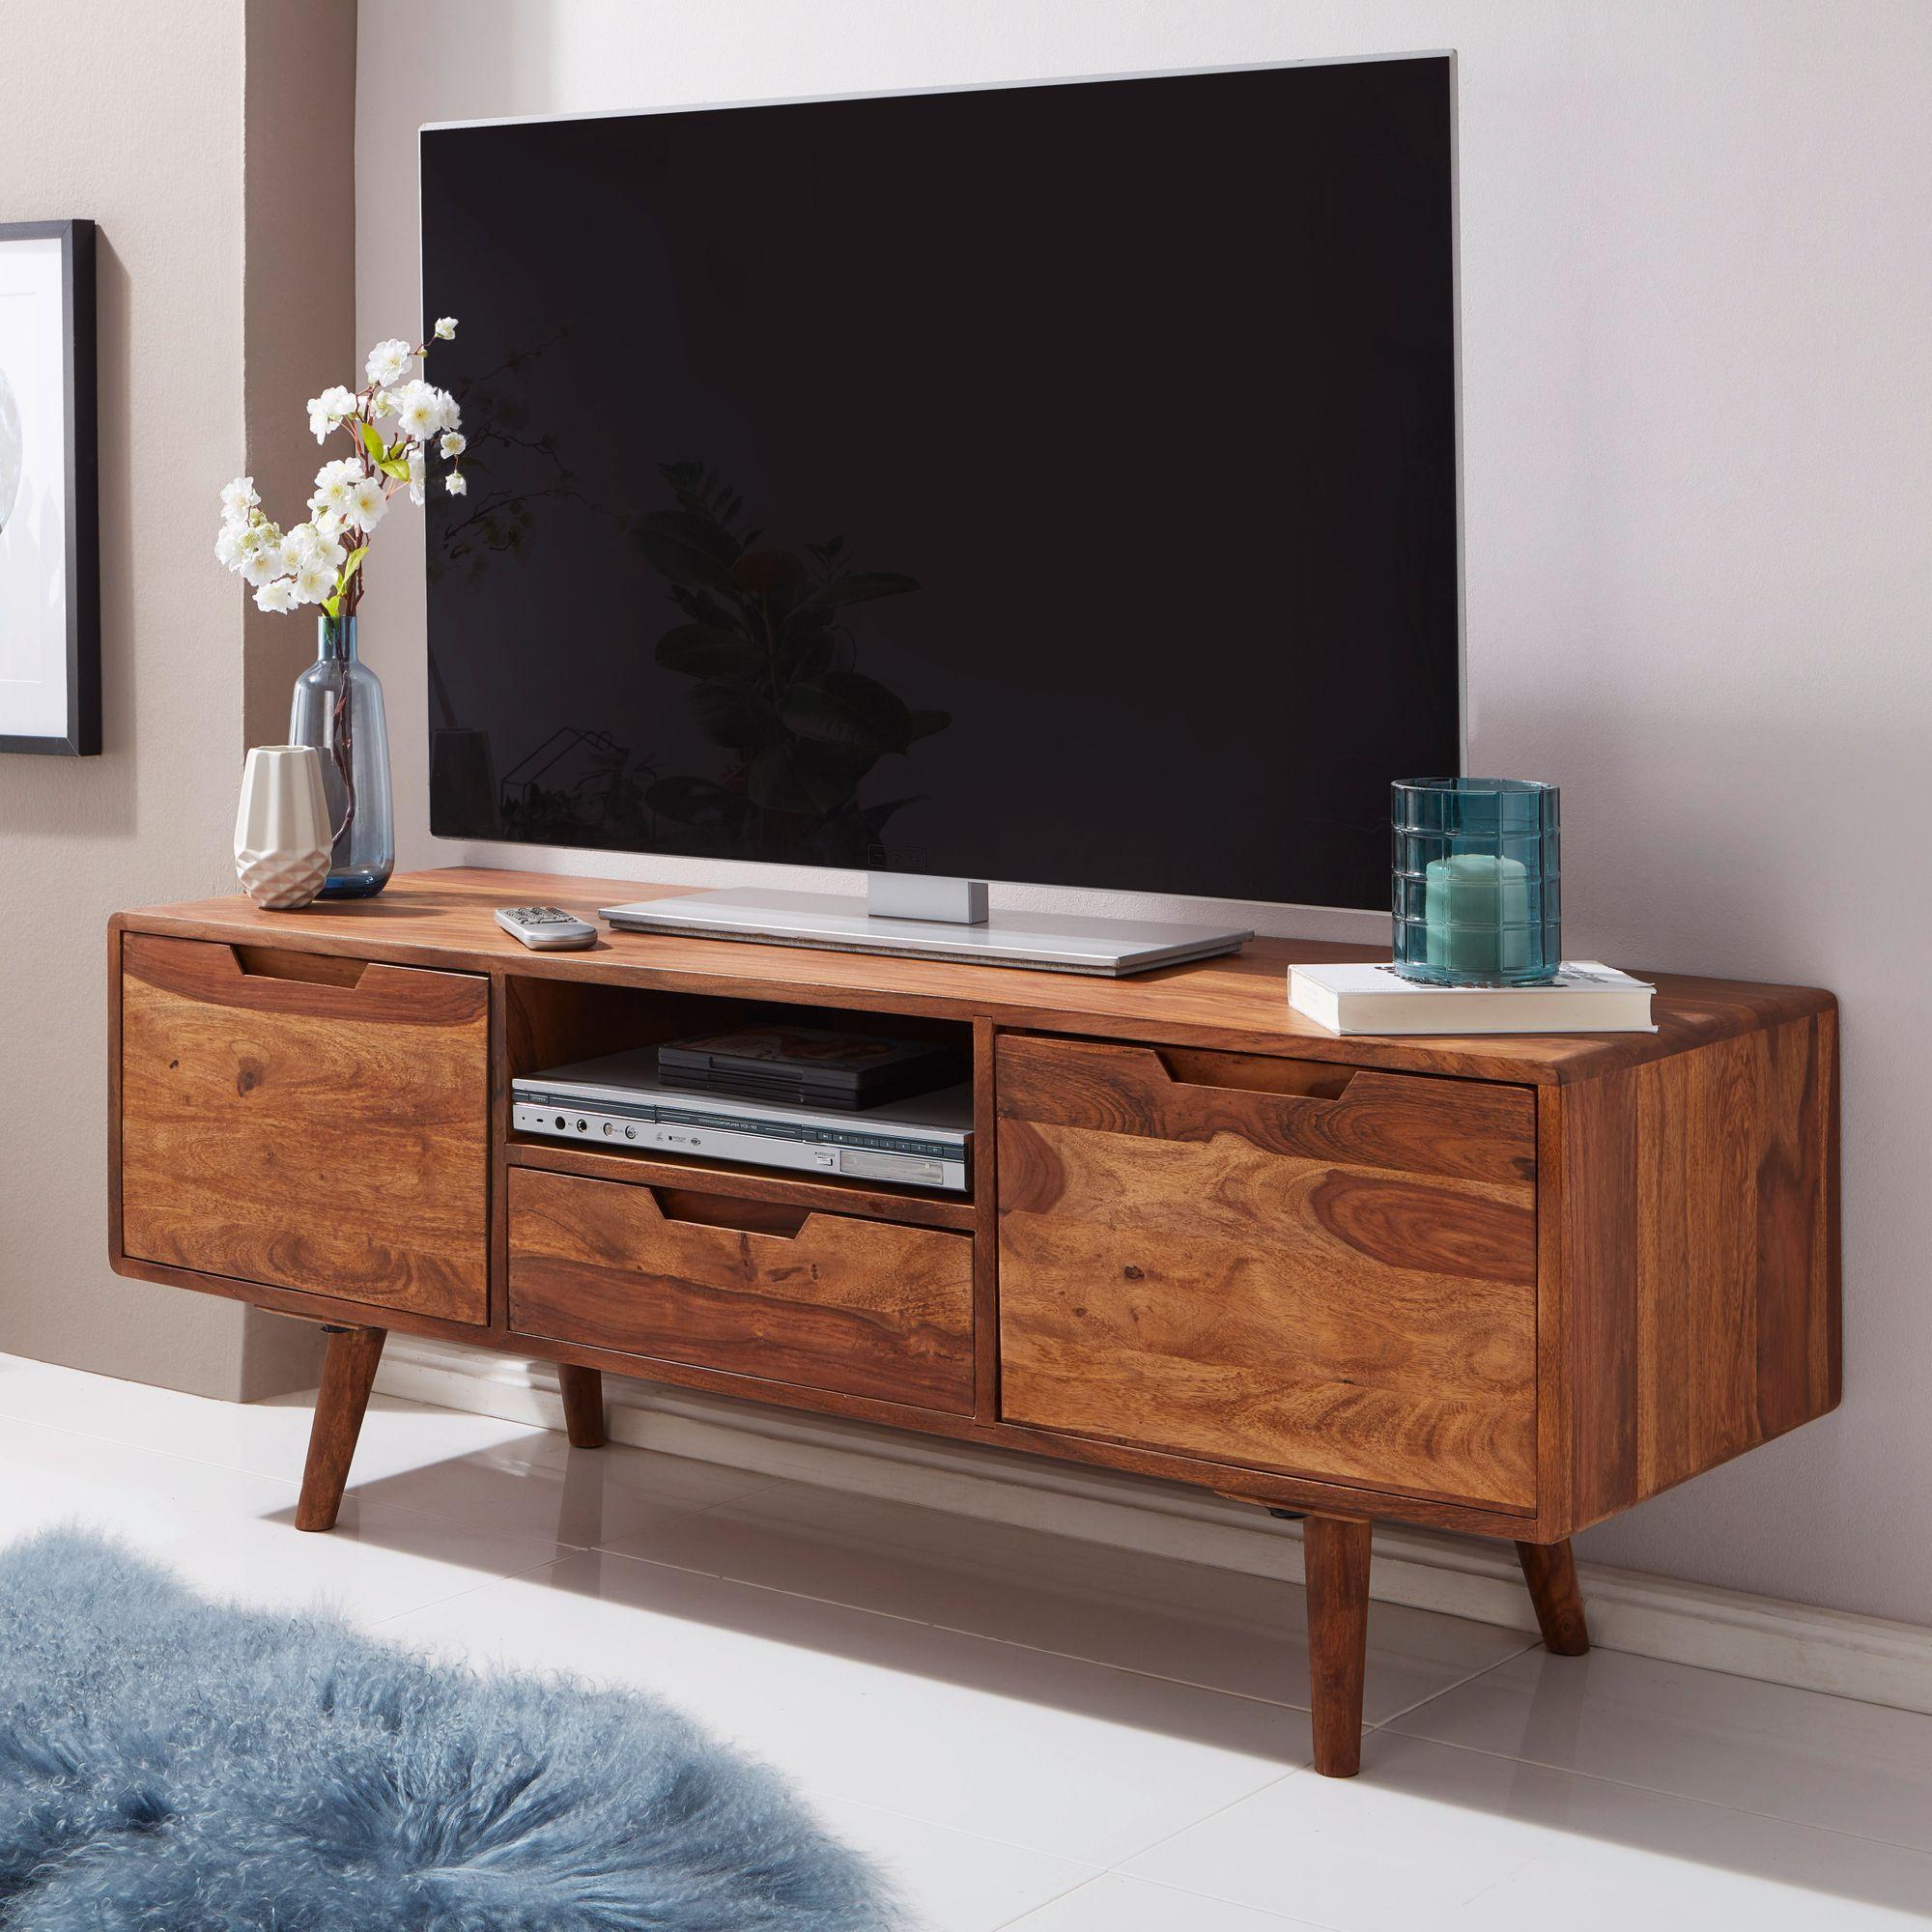 Wohnling Tv Lowboard Amana Holz Fernsehkommode Massiv Landhaus Fernsehschrank